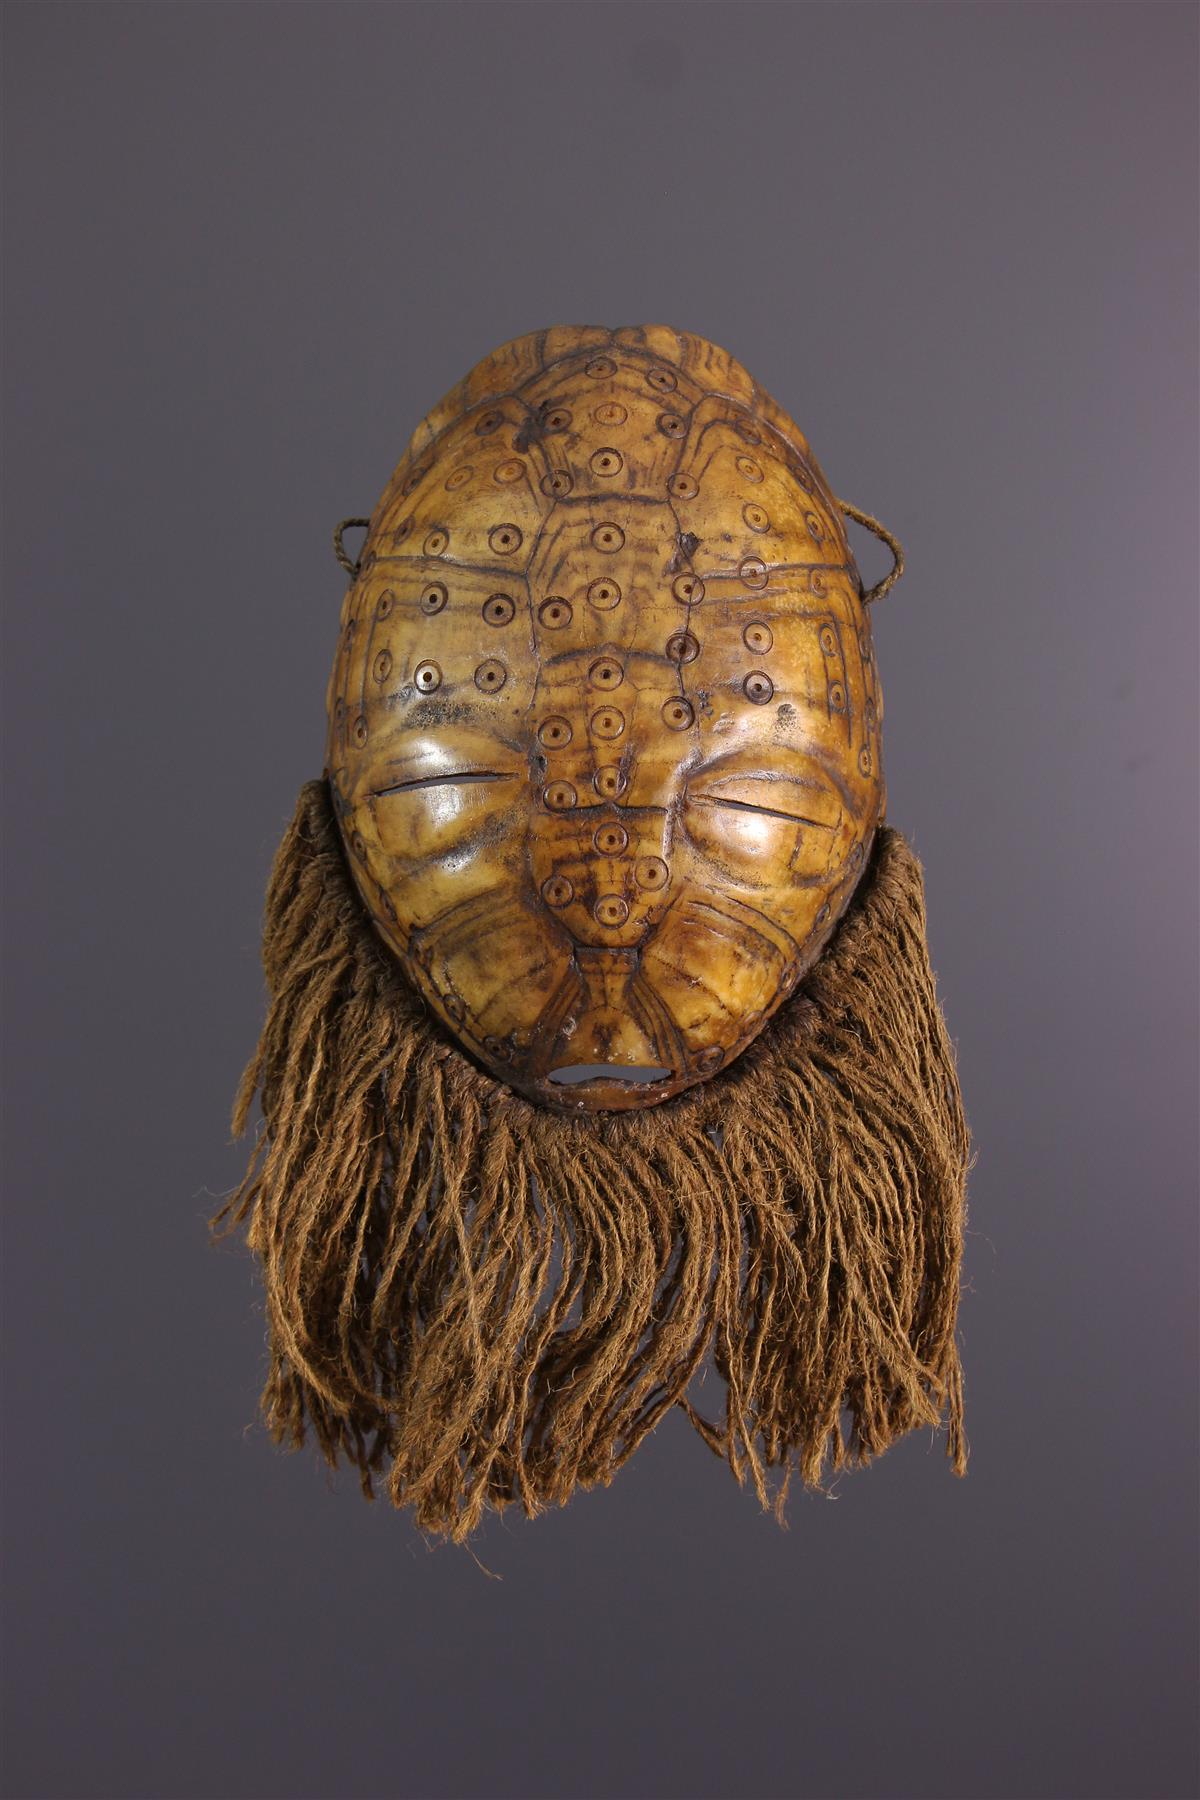 Lega mask - Tribal art